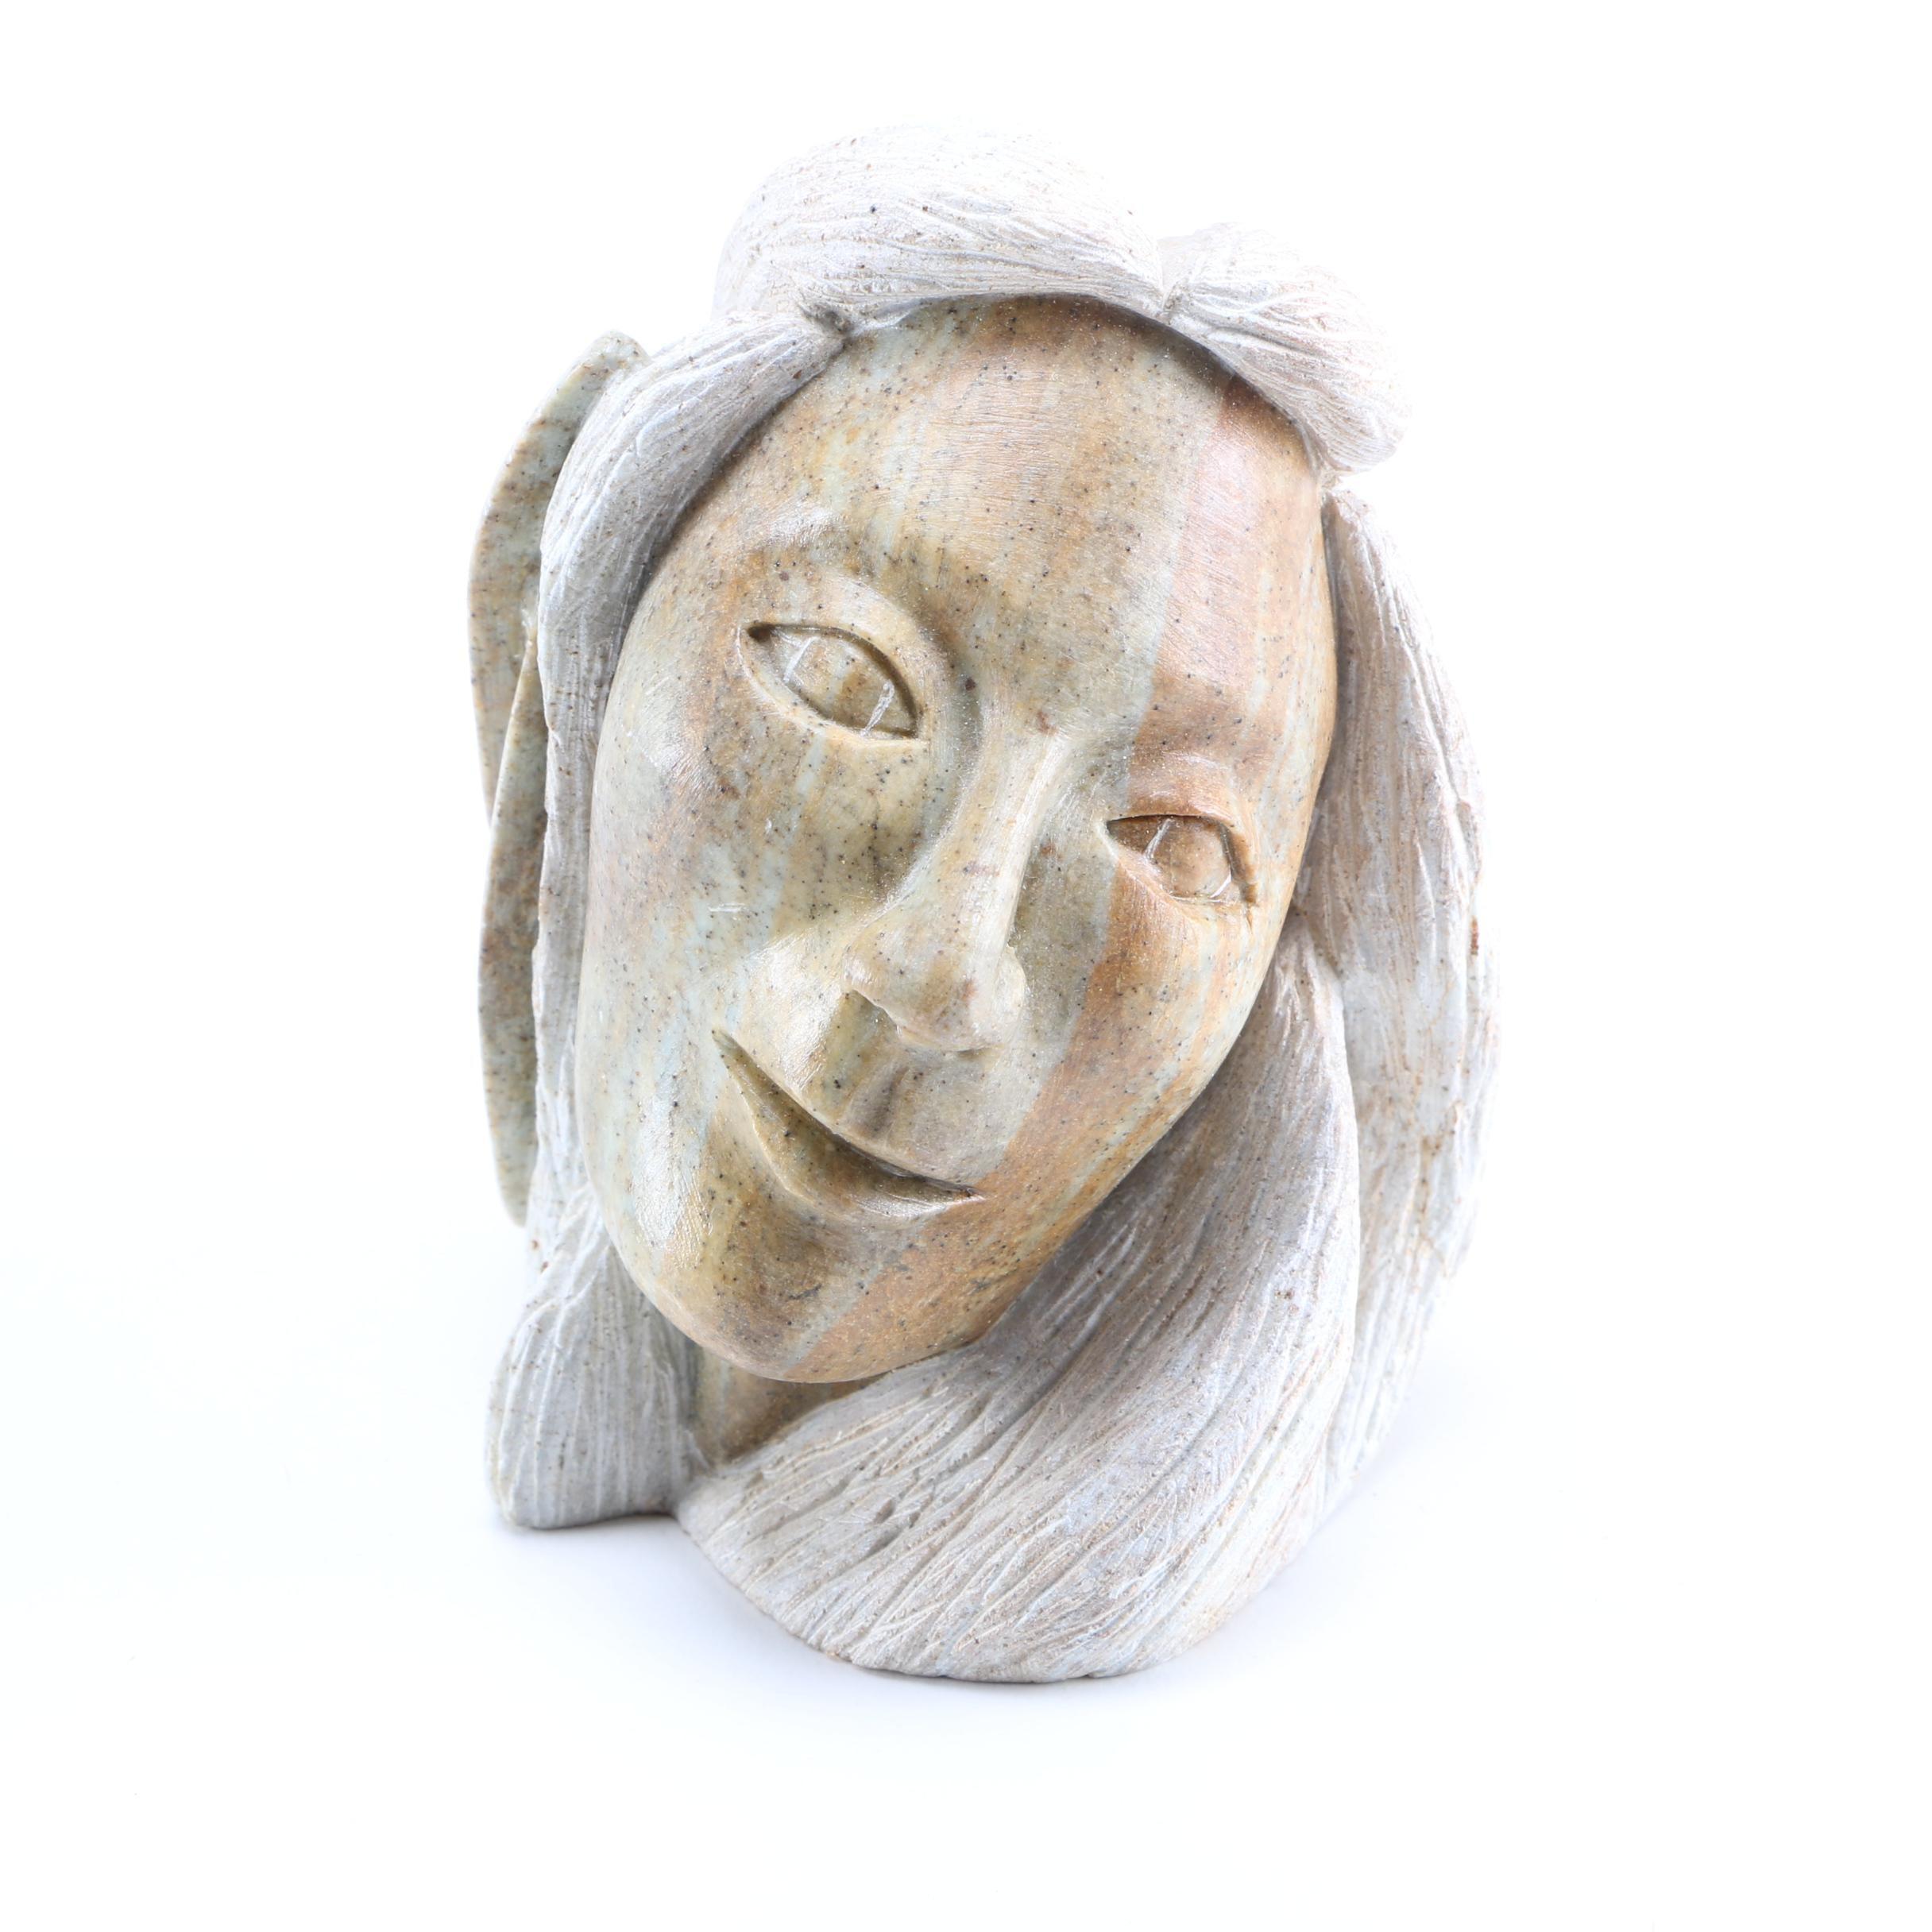 1993 Loreene Henry Soapstone Sculpture of a Woman